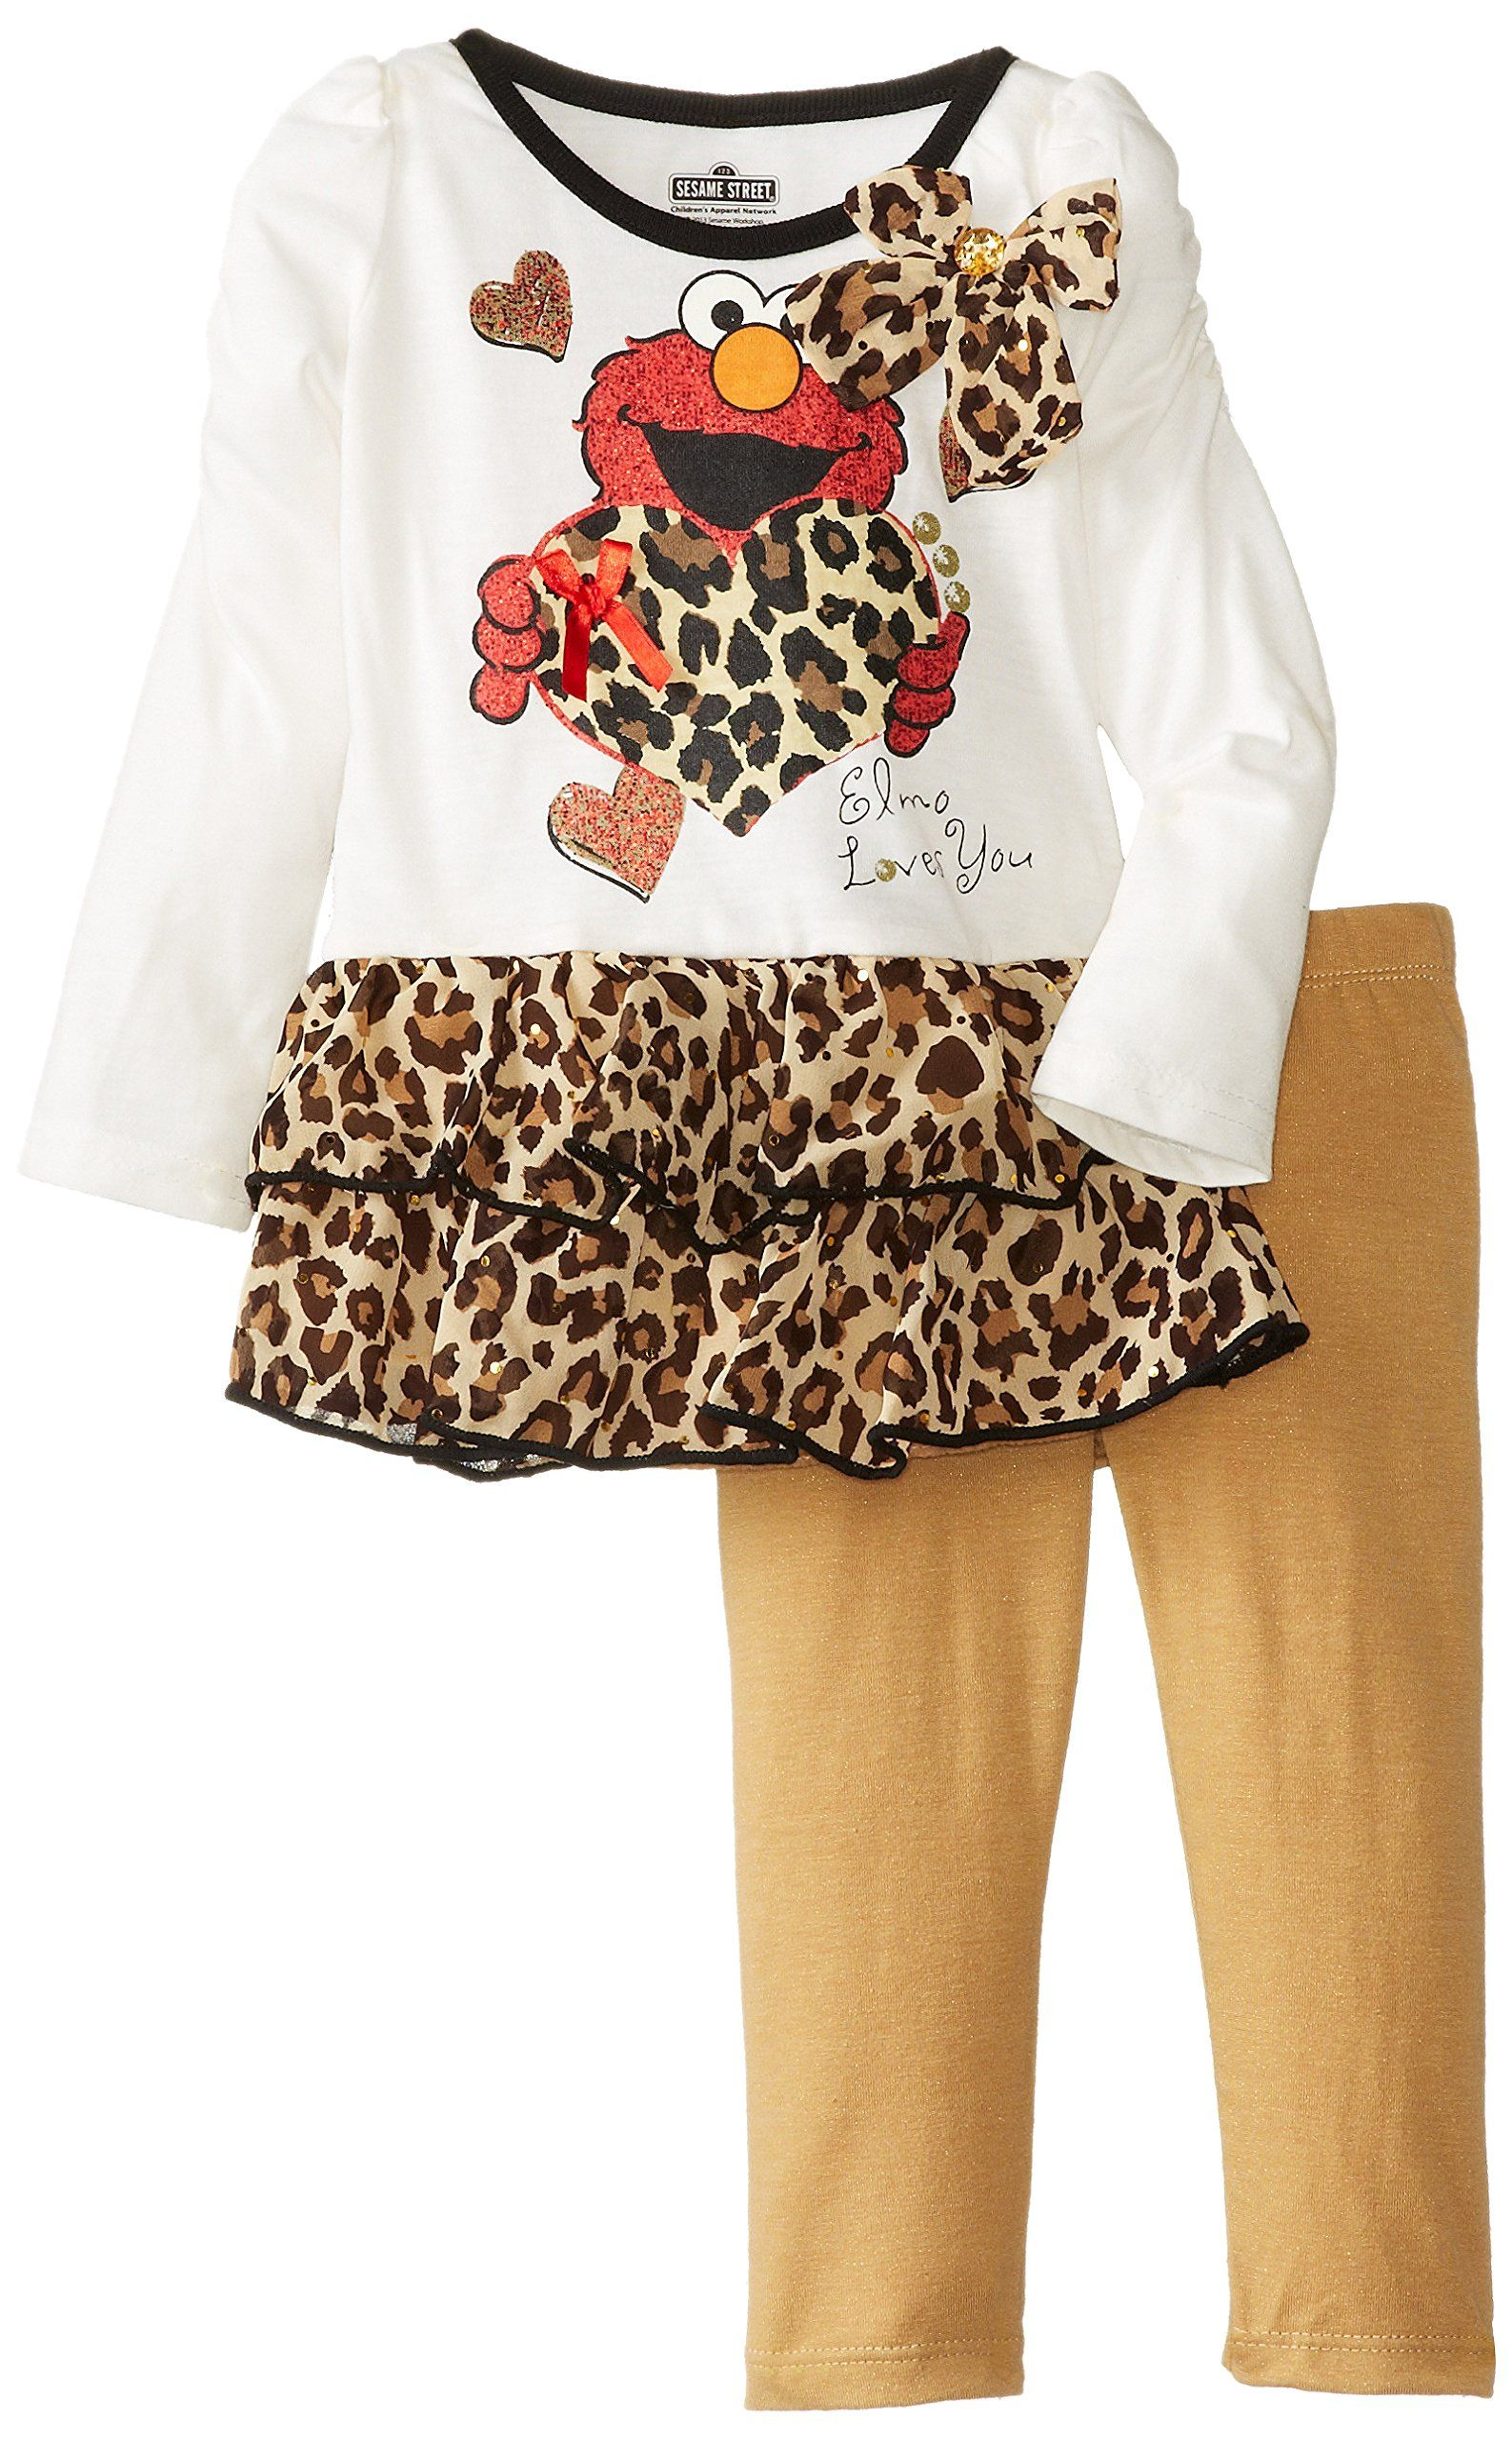 17c38572f9f6c Sesame St Baby Girls Elmo 2 Piece Print Long Sleeve Legging Set Vanilla 12  Months *** For more information, visit image link.(It is Amazon affiliate  link) # ...